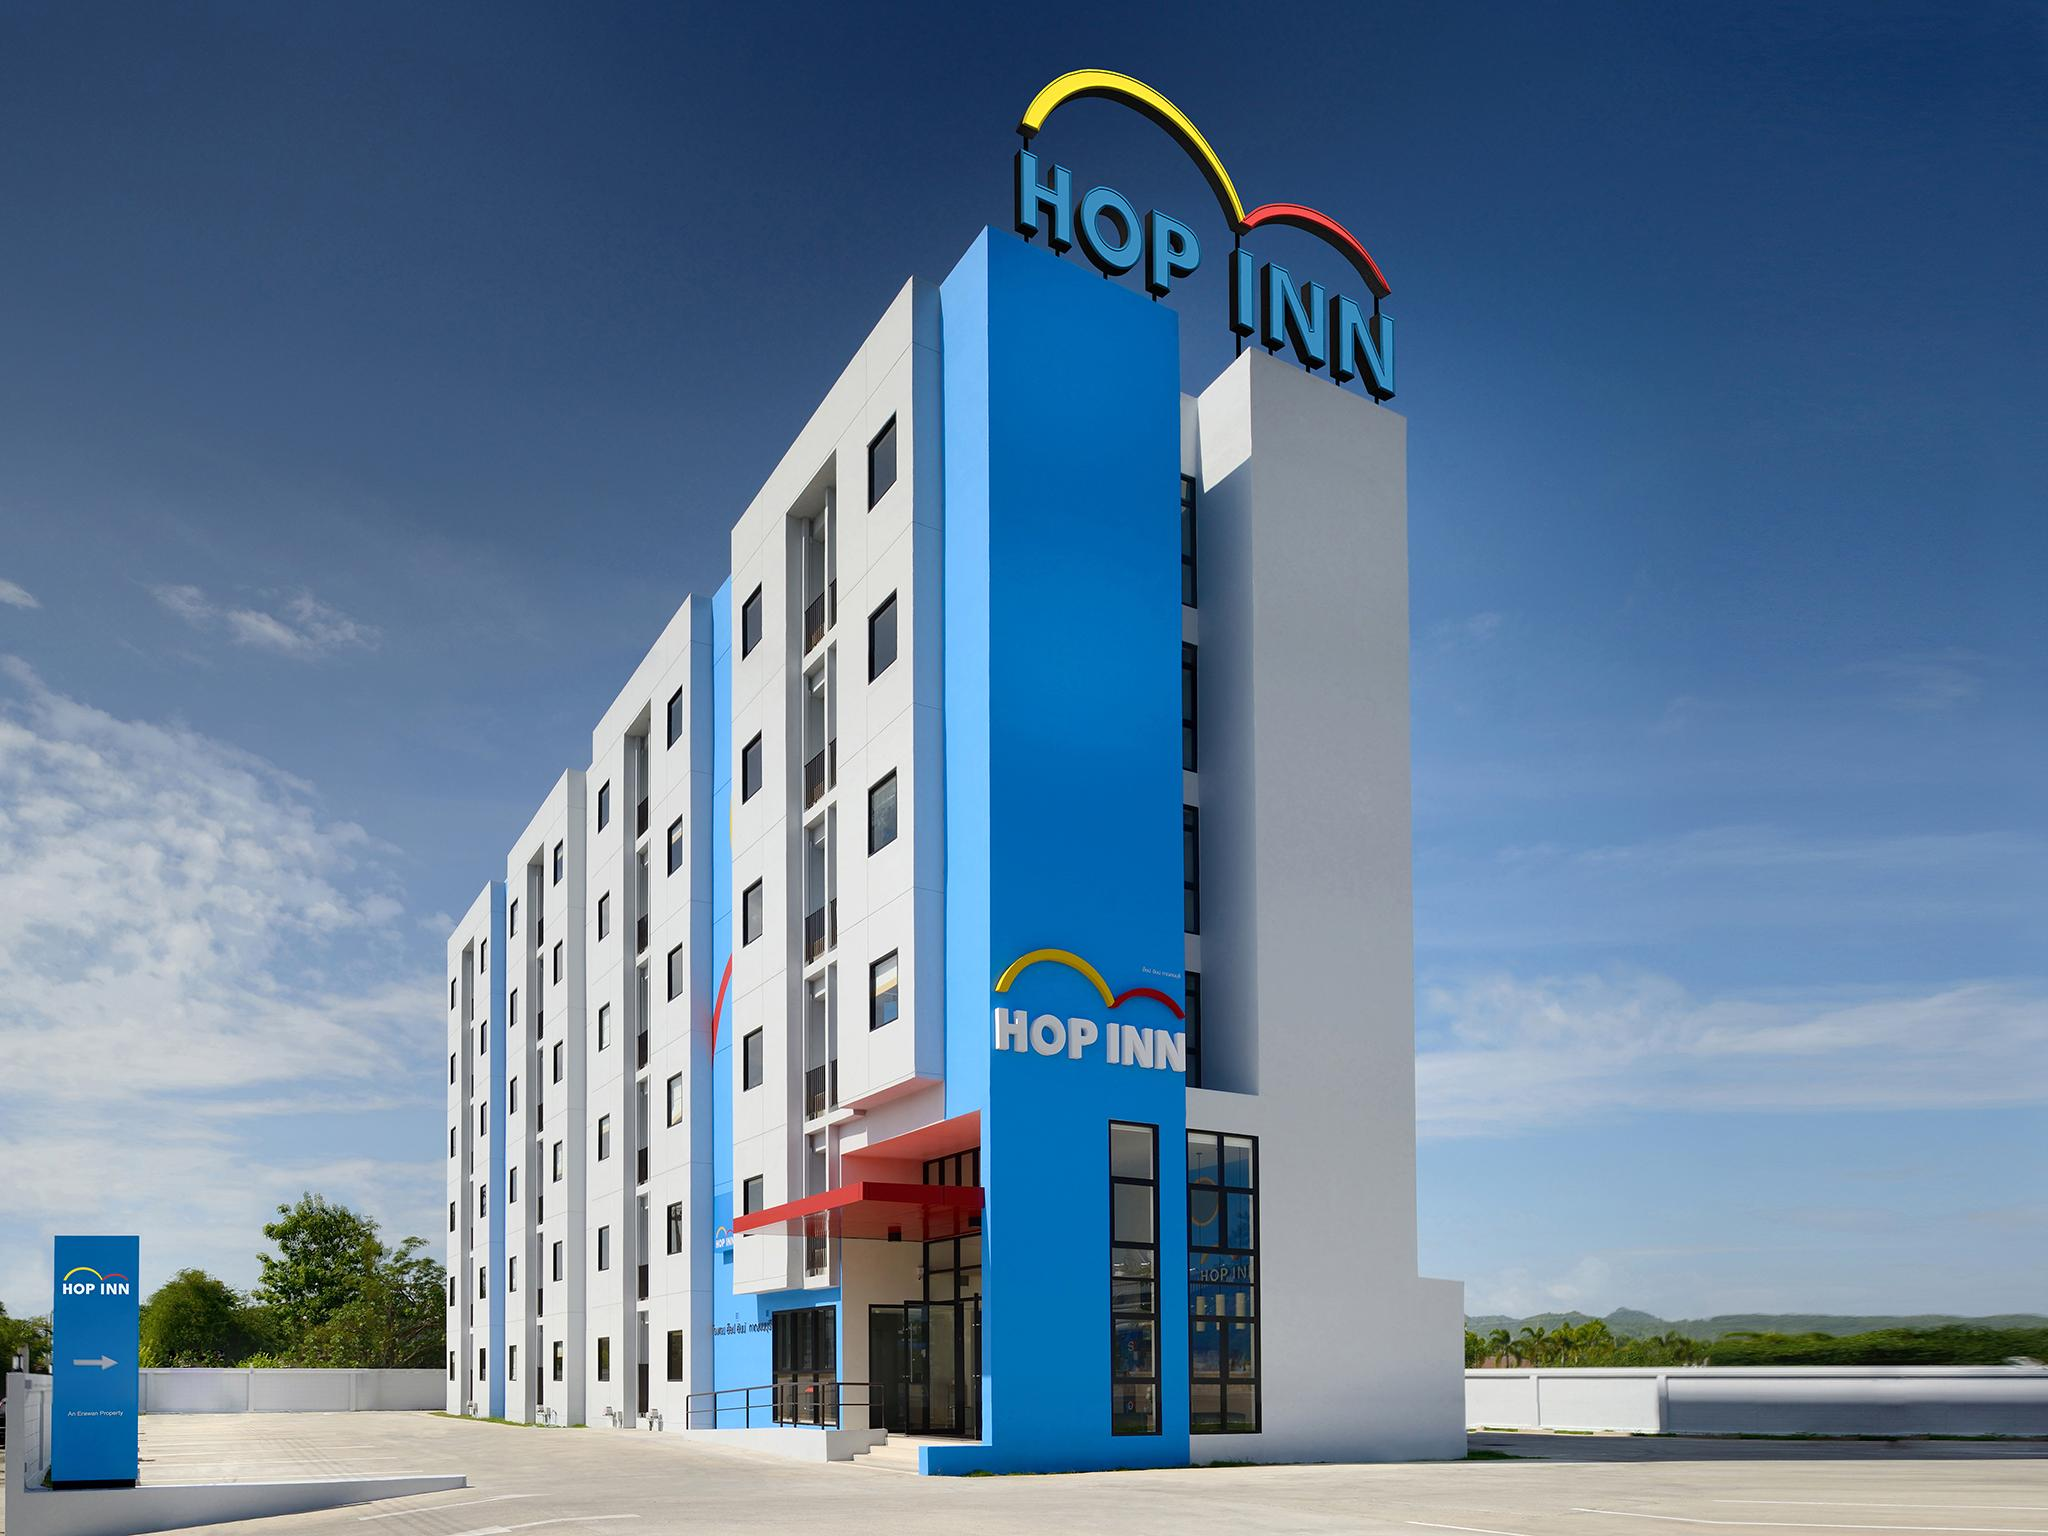 Hop Inn Ubon Ratchathani,ฮ็อป อินน์ อุบลราชธานี